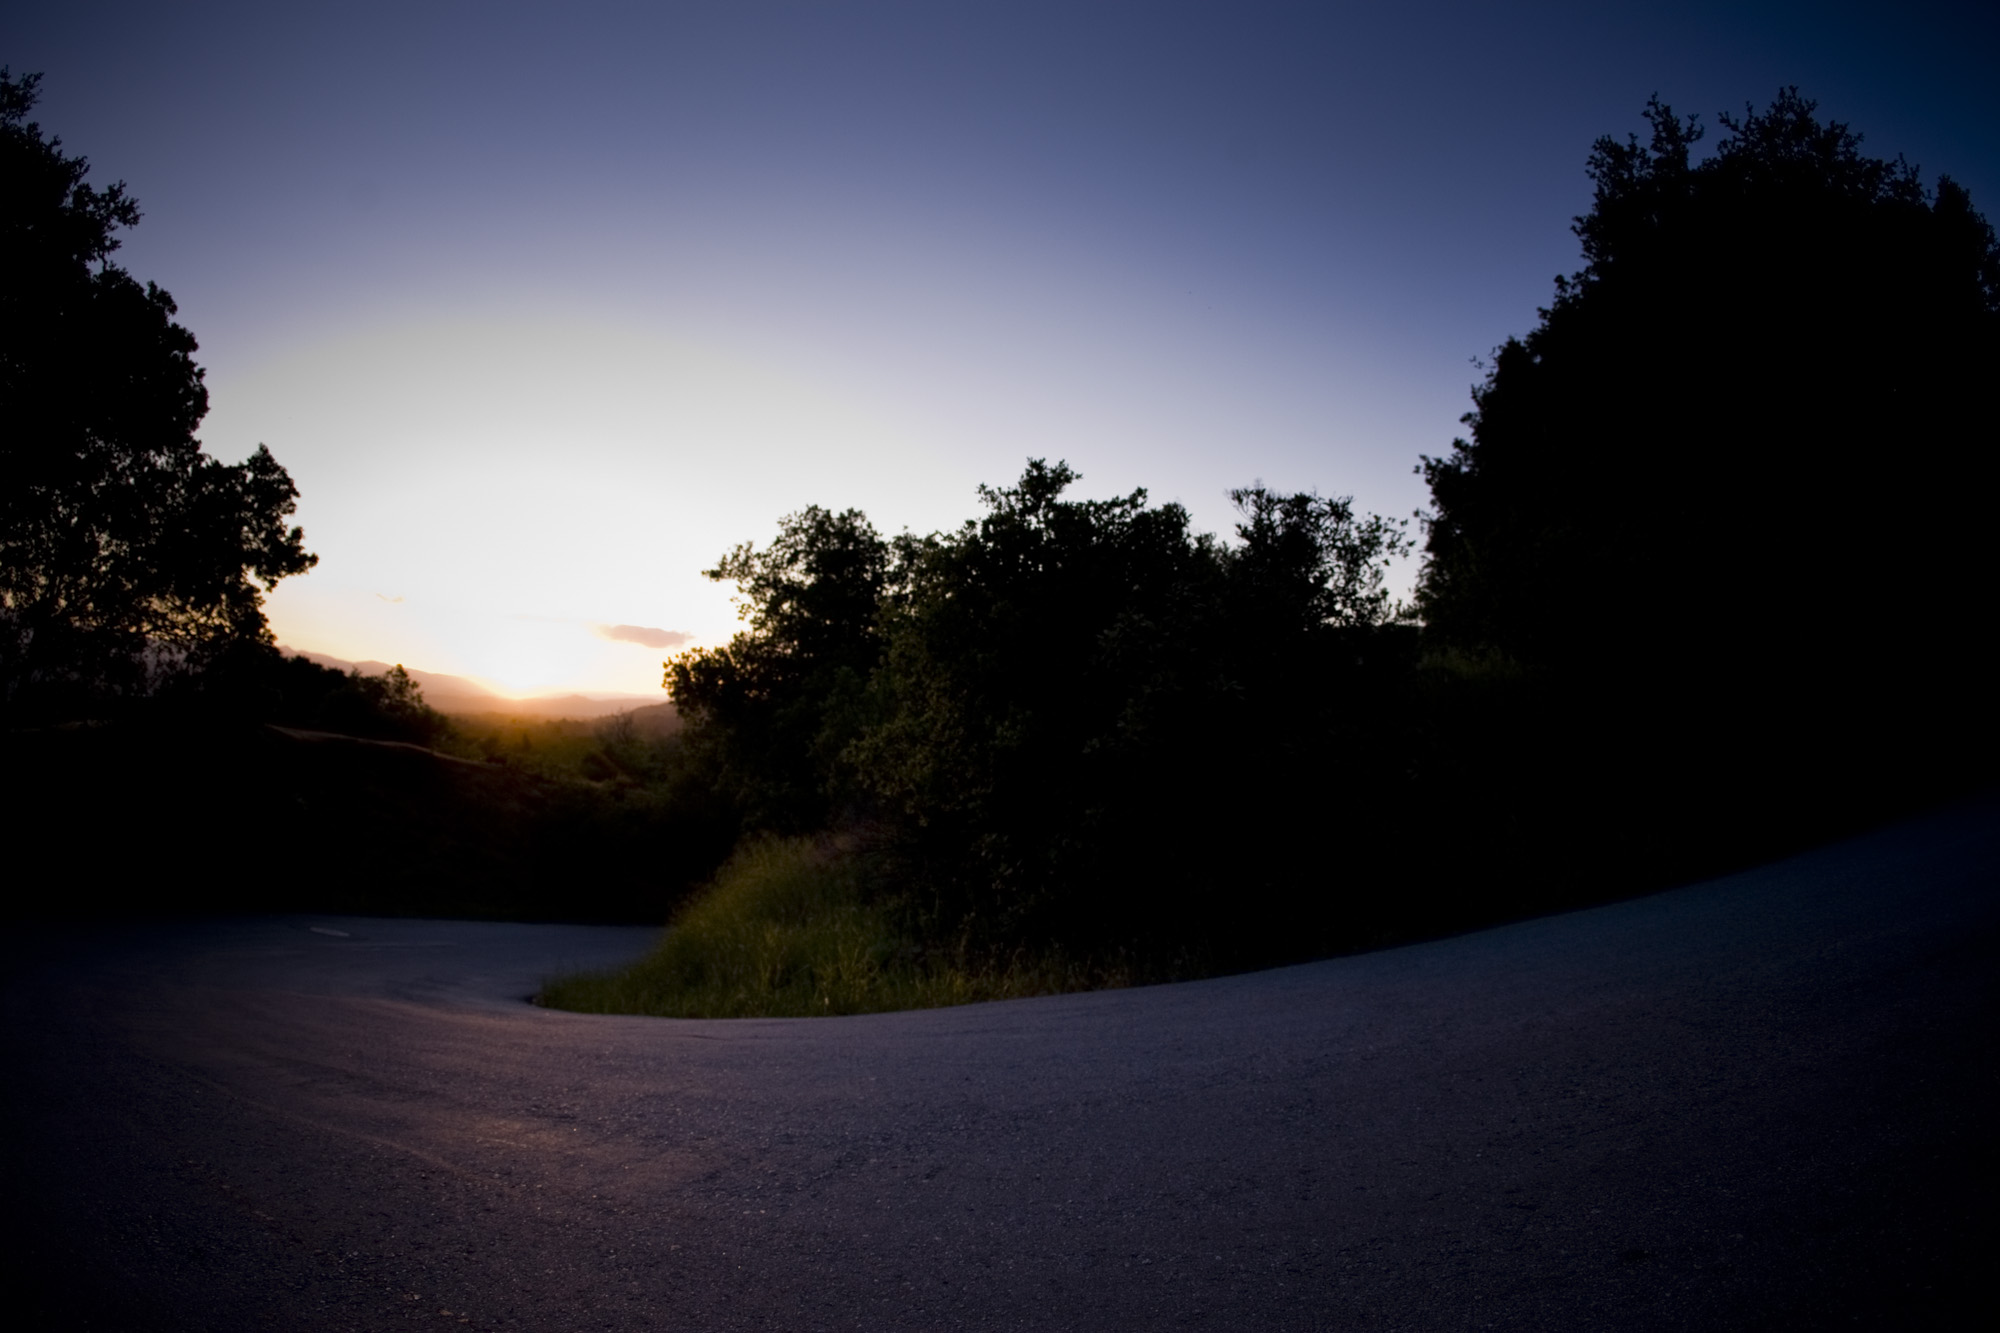 SLorence_roadphoto_003.JPG